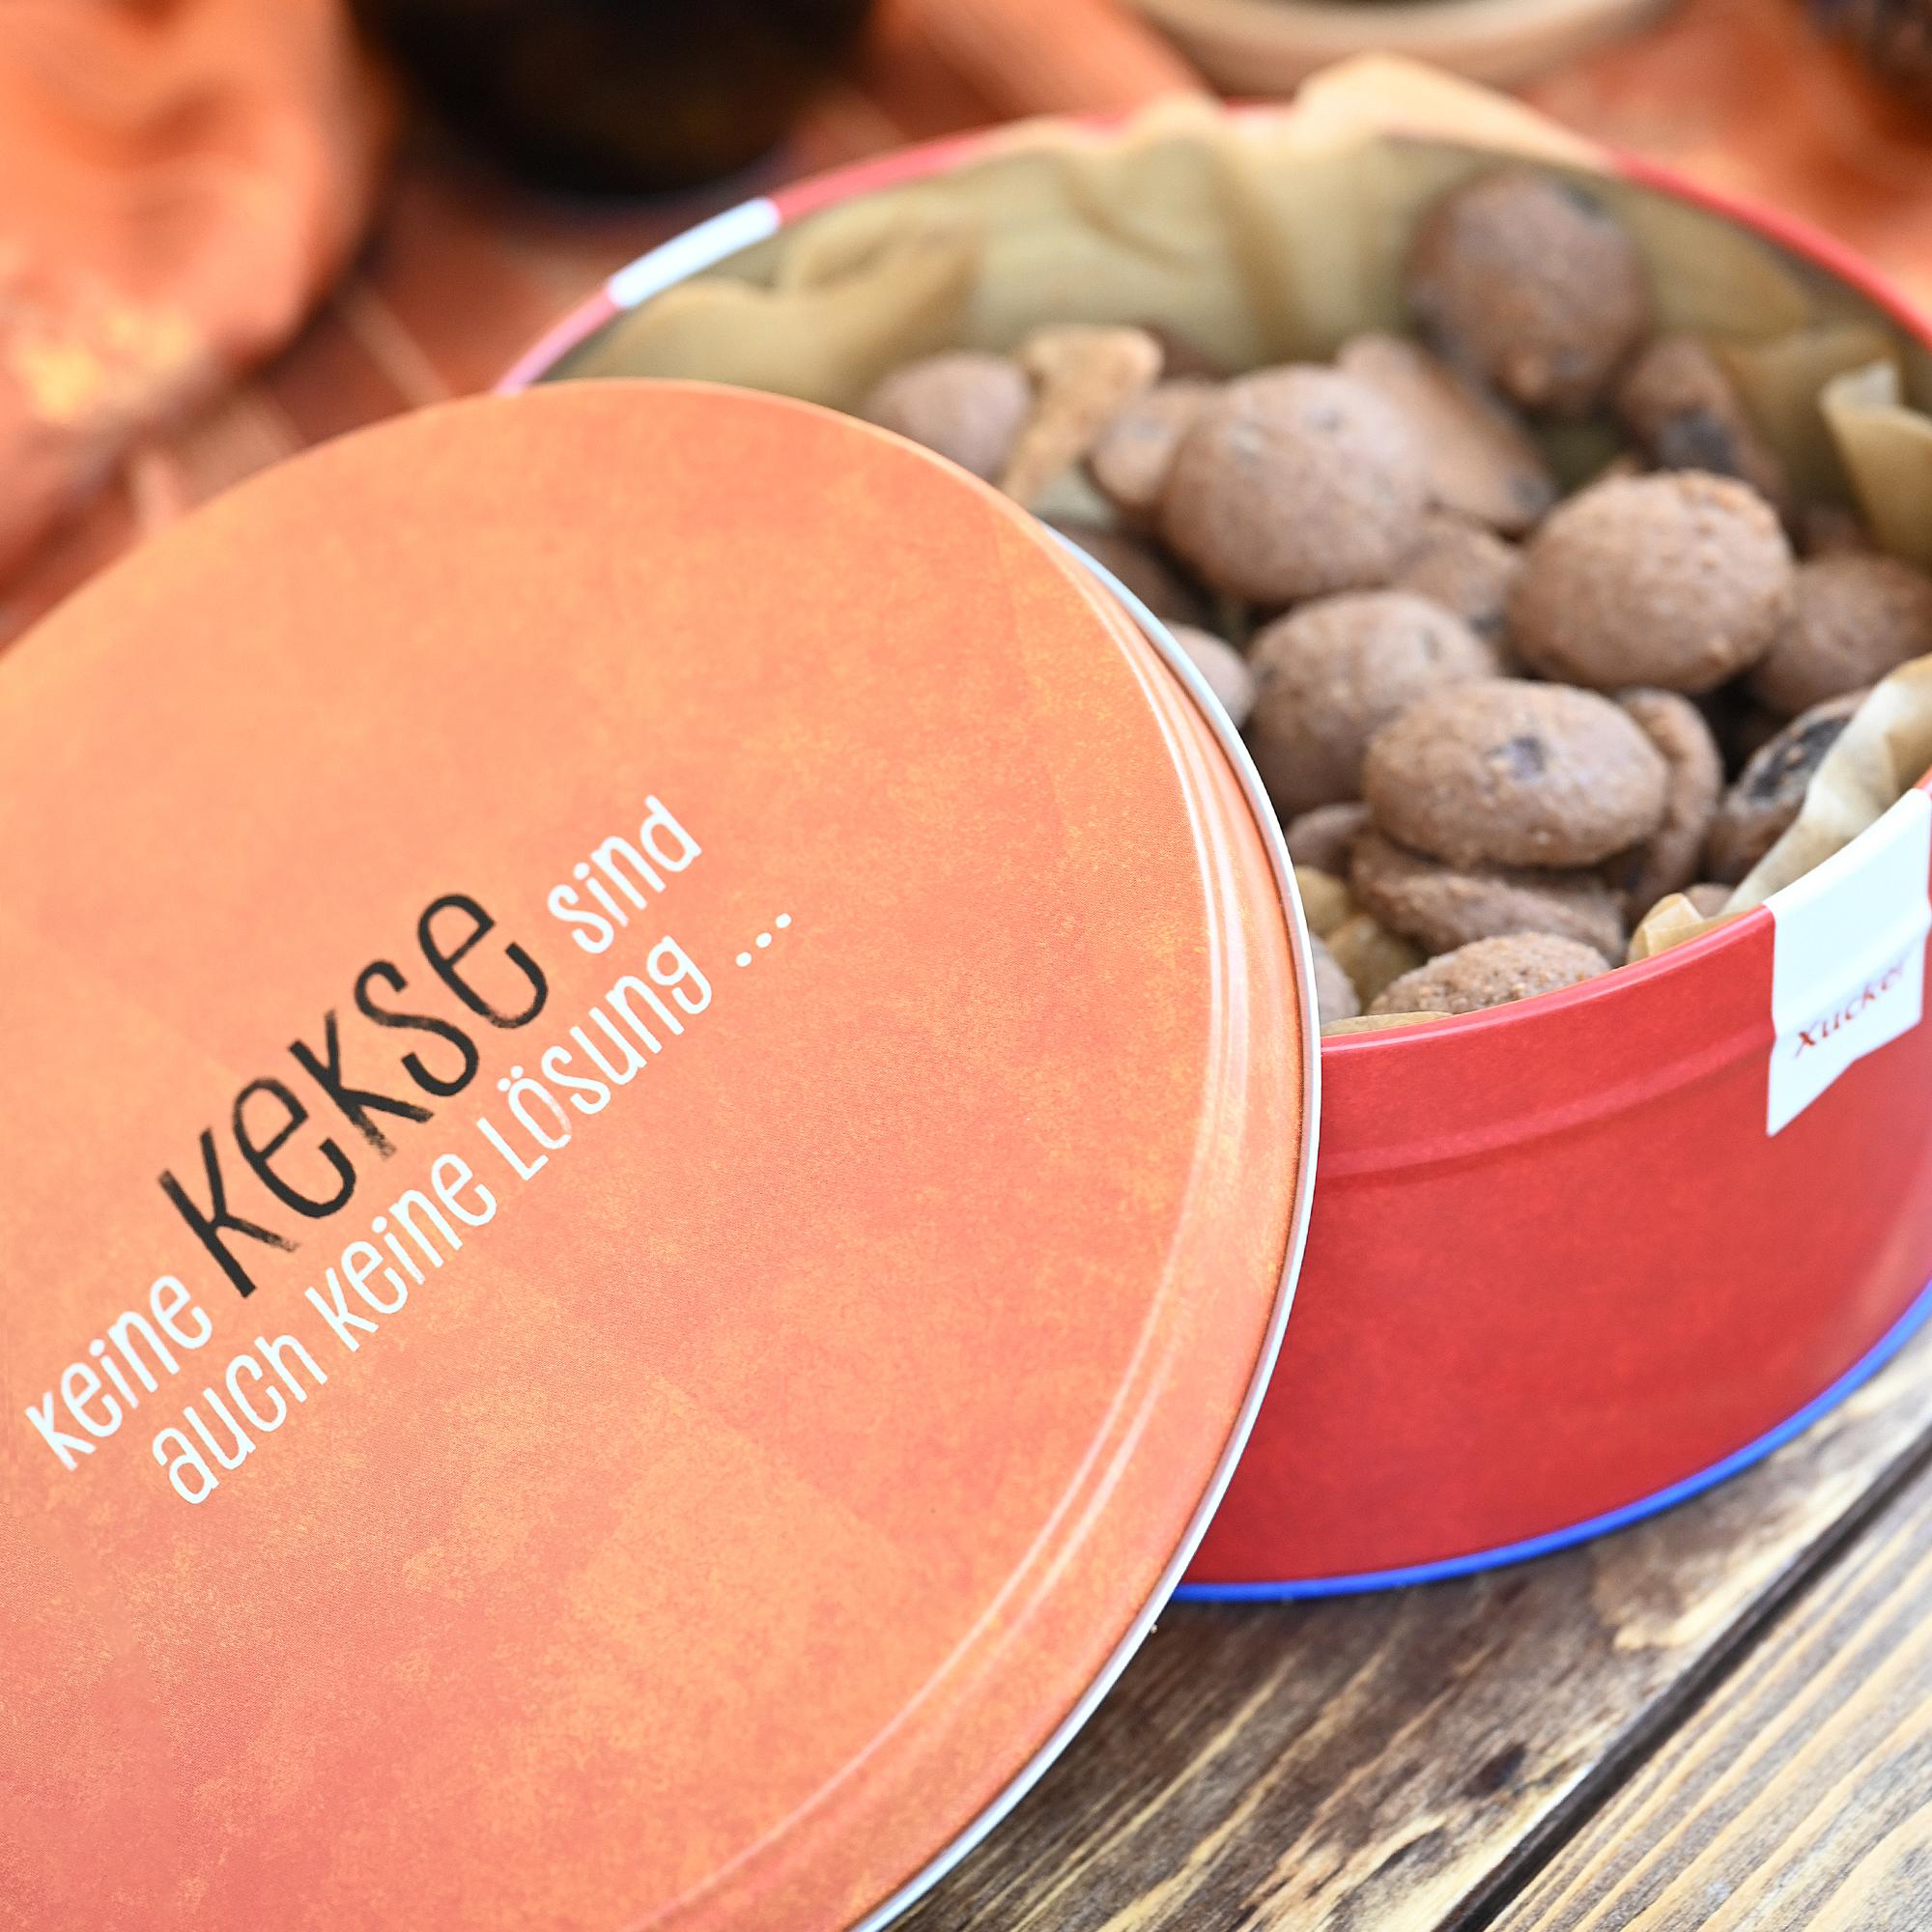 Xucker Keksdose und Knusperkeke